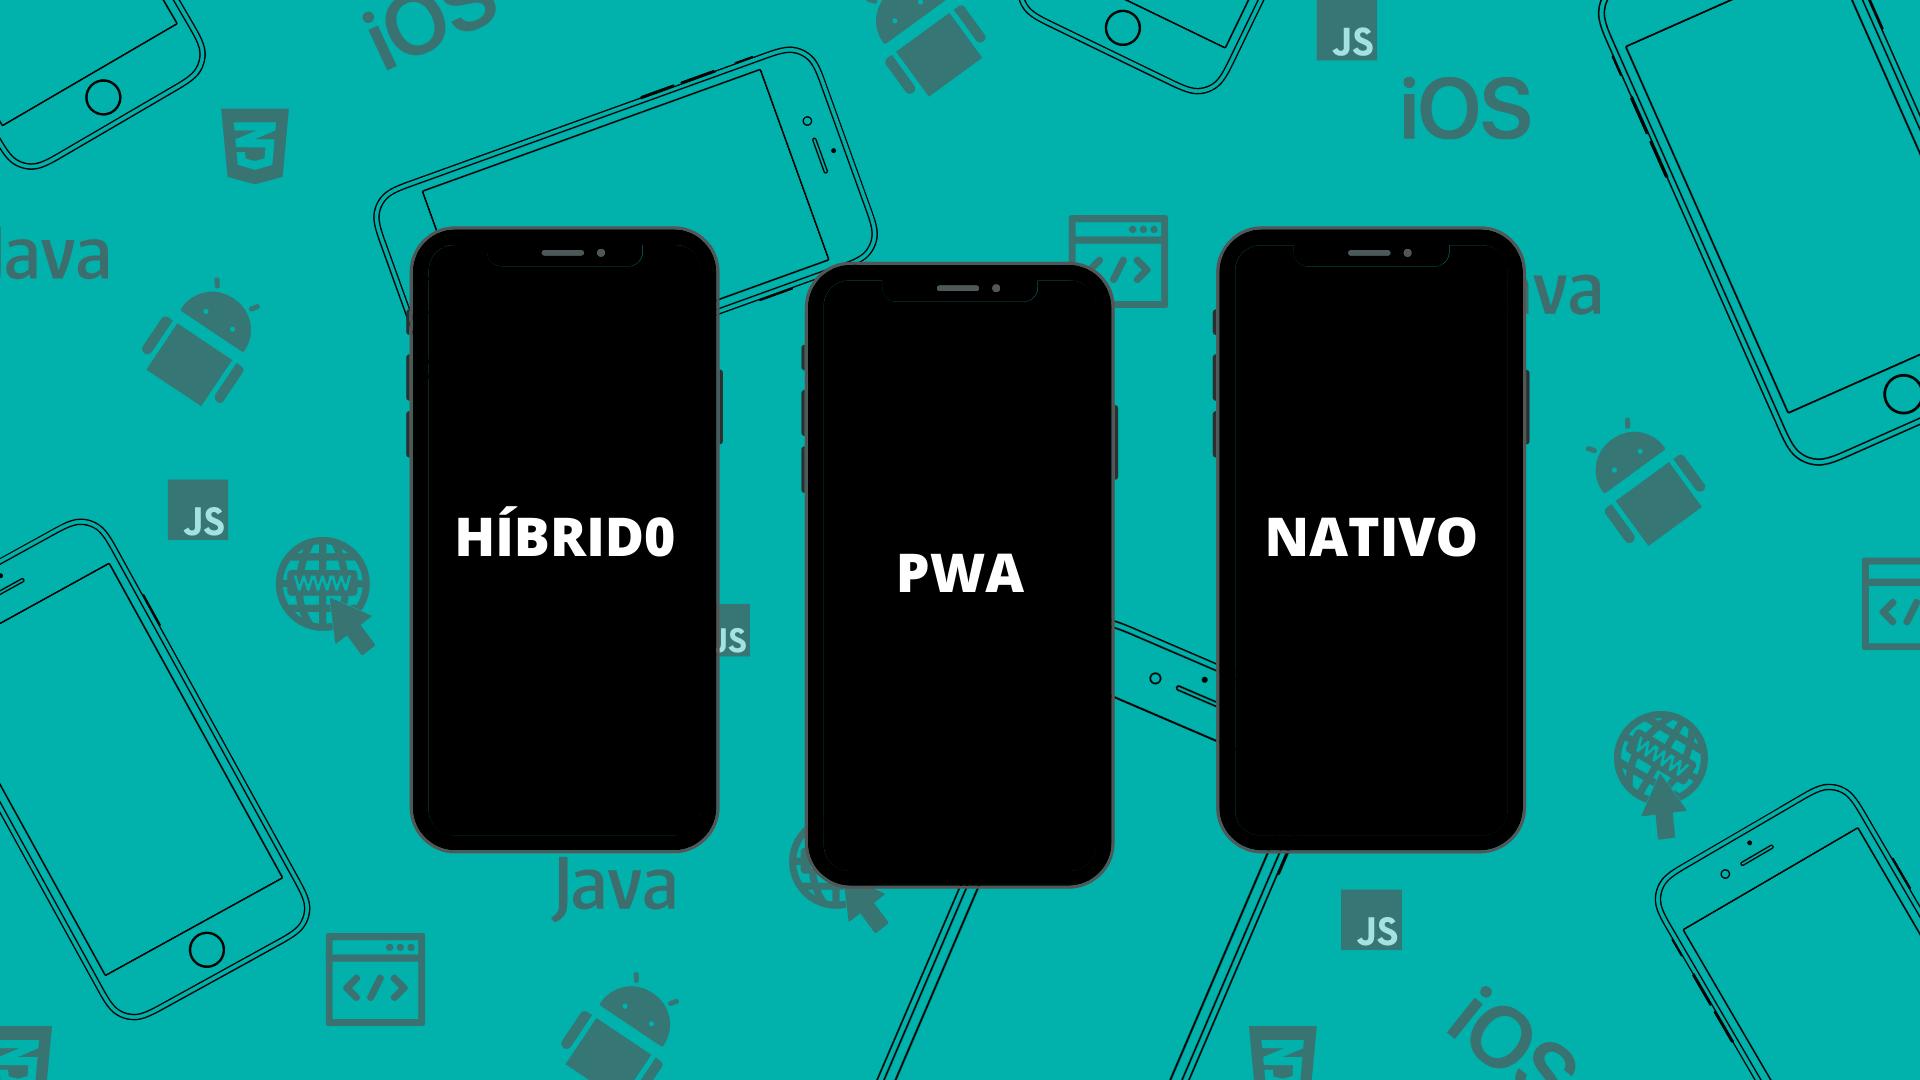 aplicativo hibrido nativo pwa possible